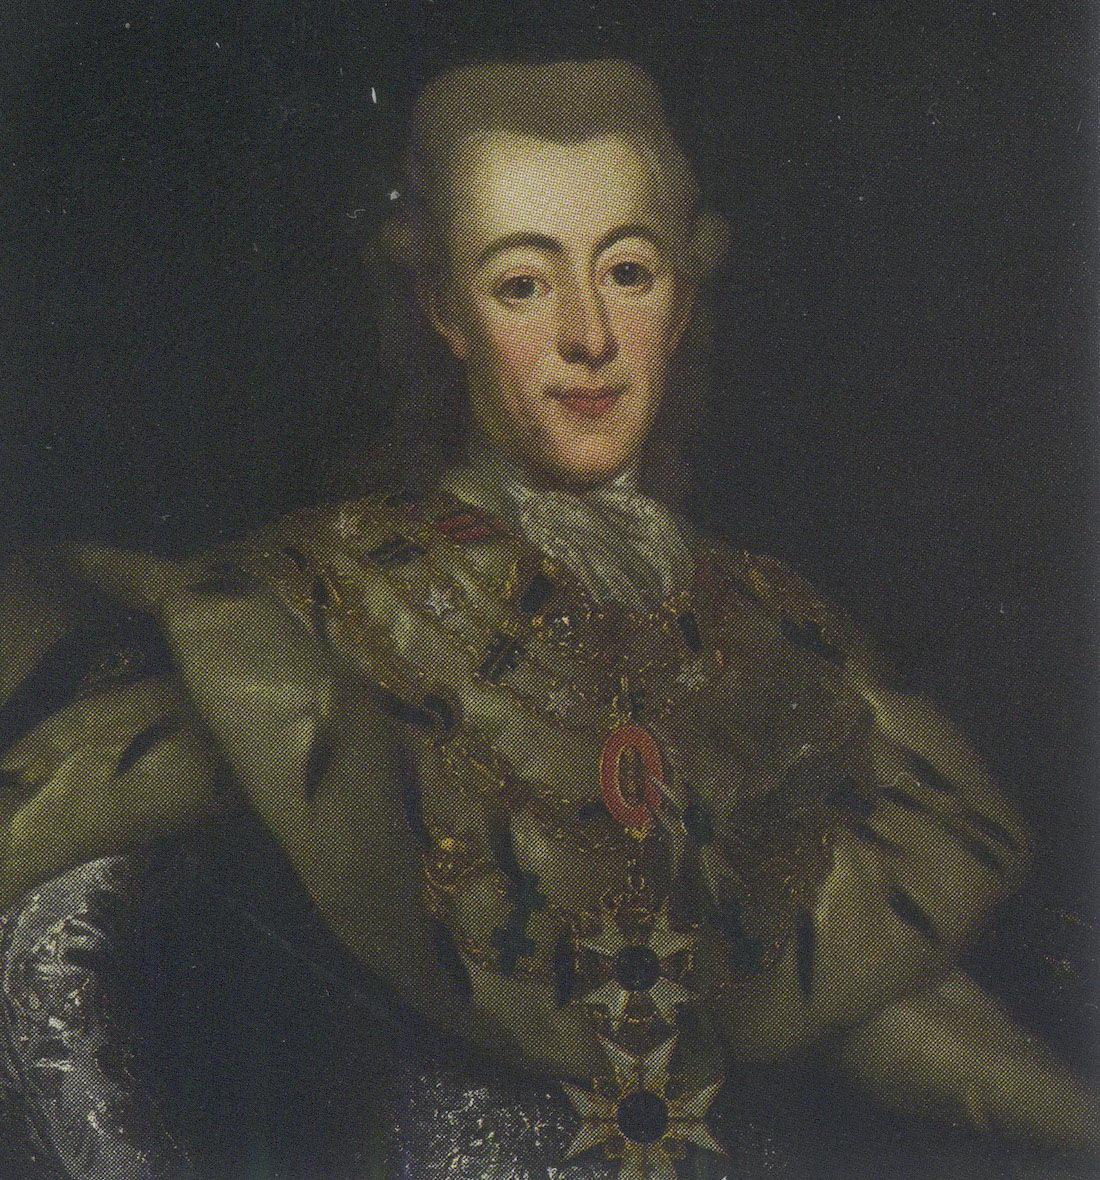 Портрет шведского короля Густава III.